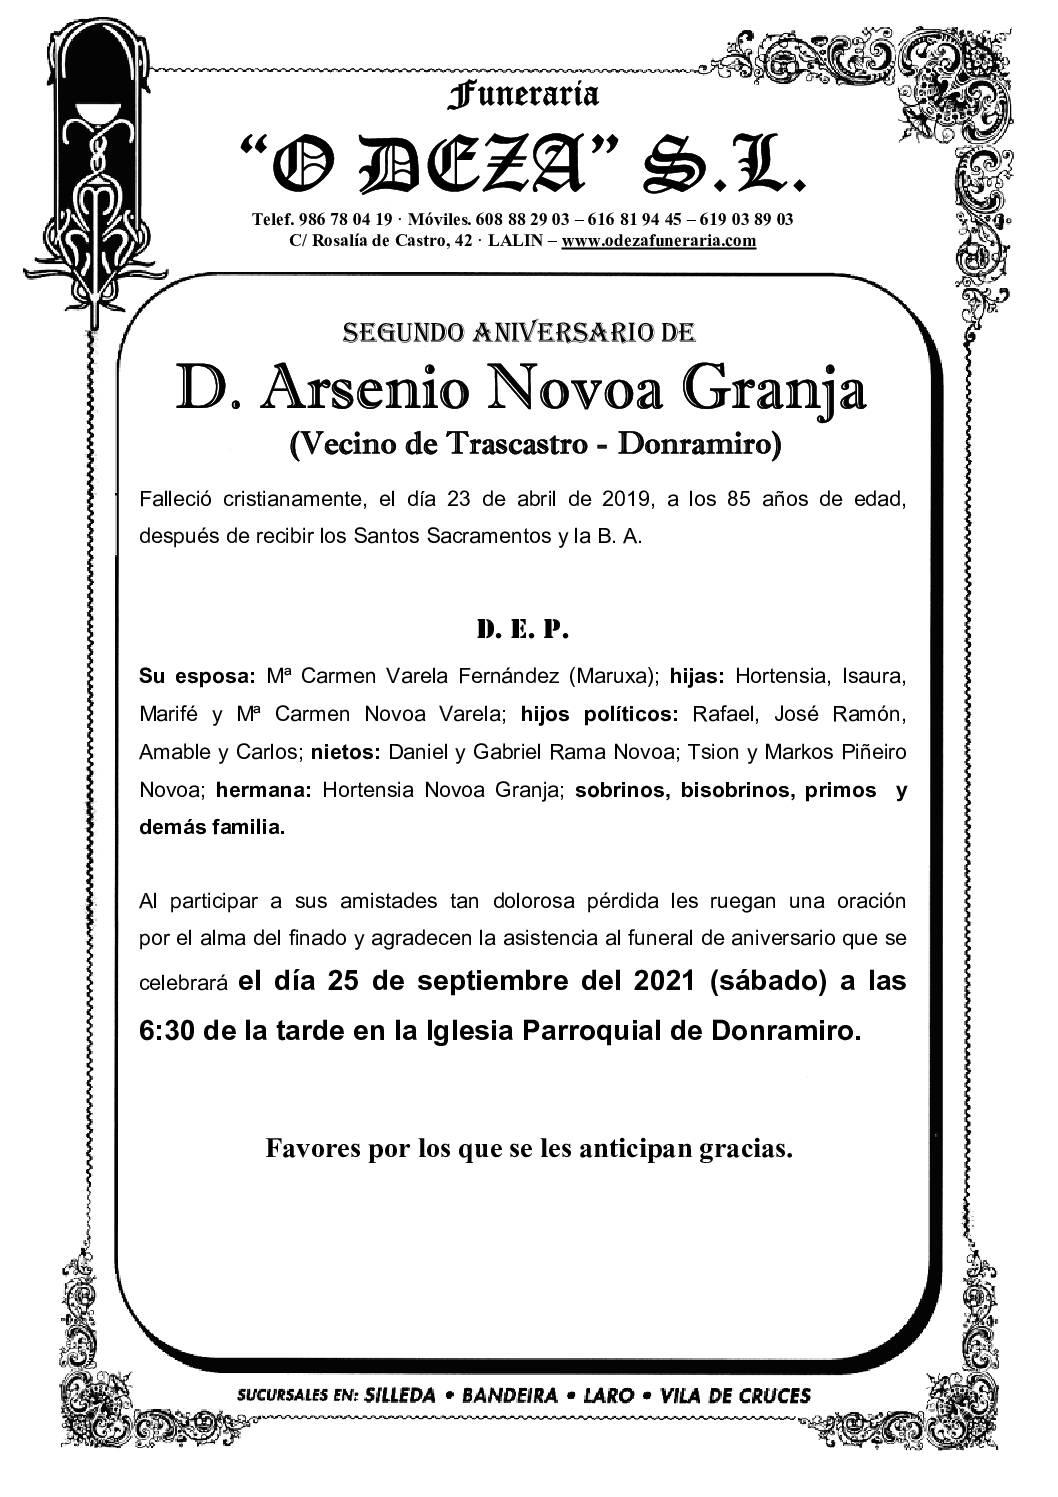 D. ARSENIO NOVOA GRANJA